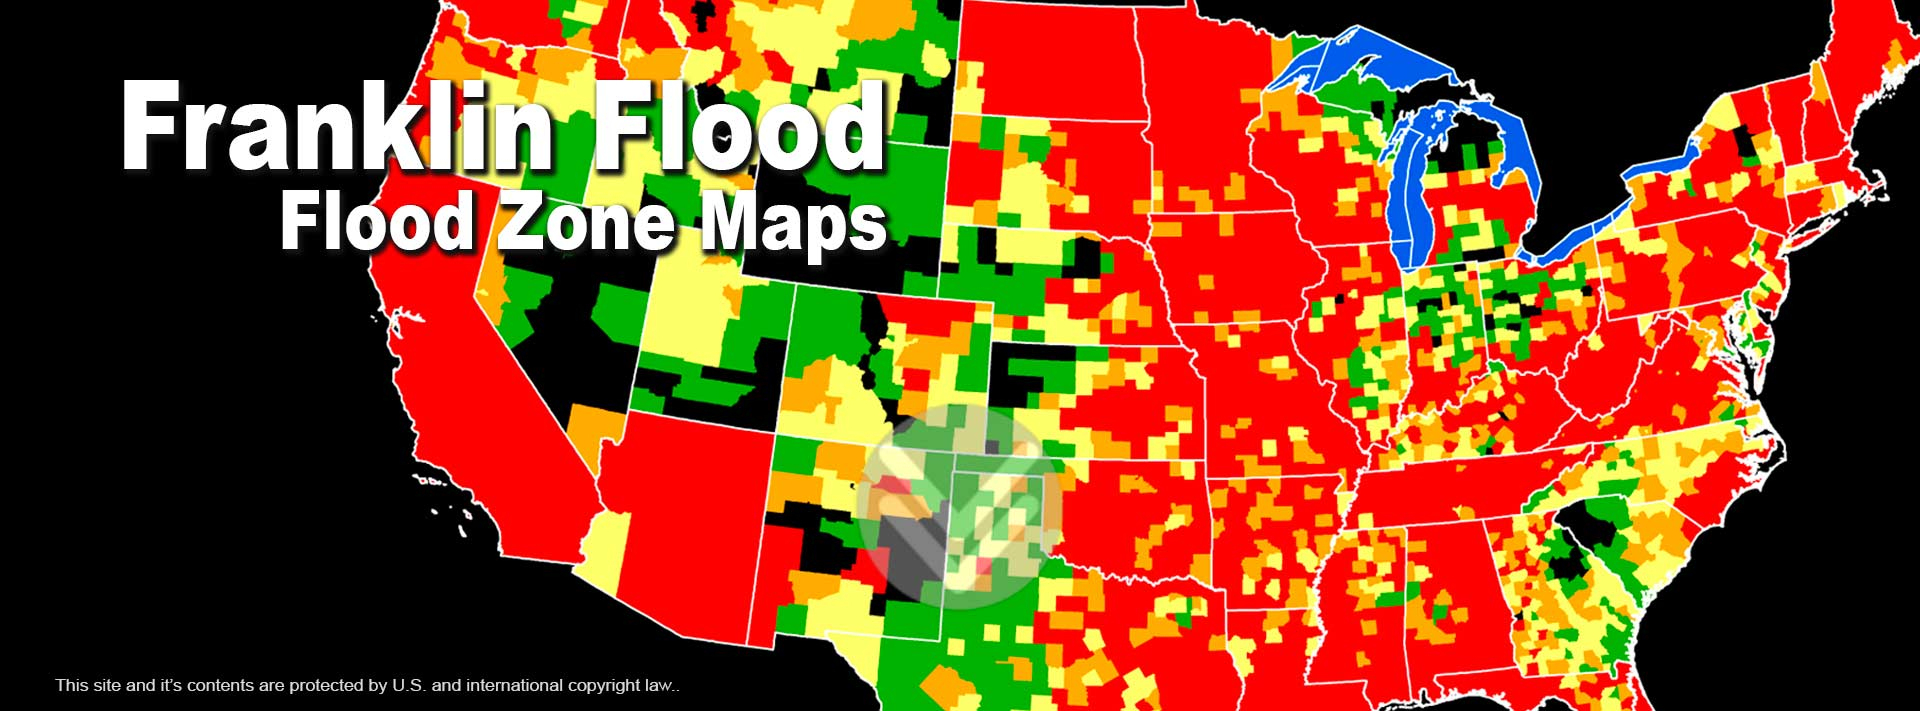 Flood Zone Rate Maps Explained - Florida Flood Risk Map